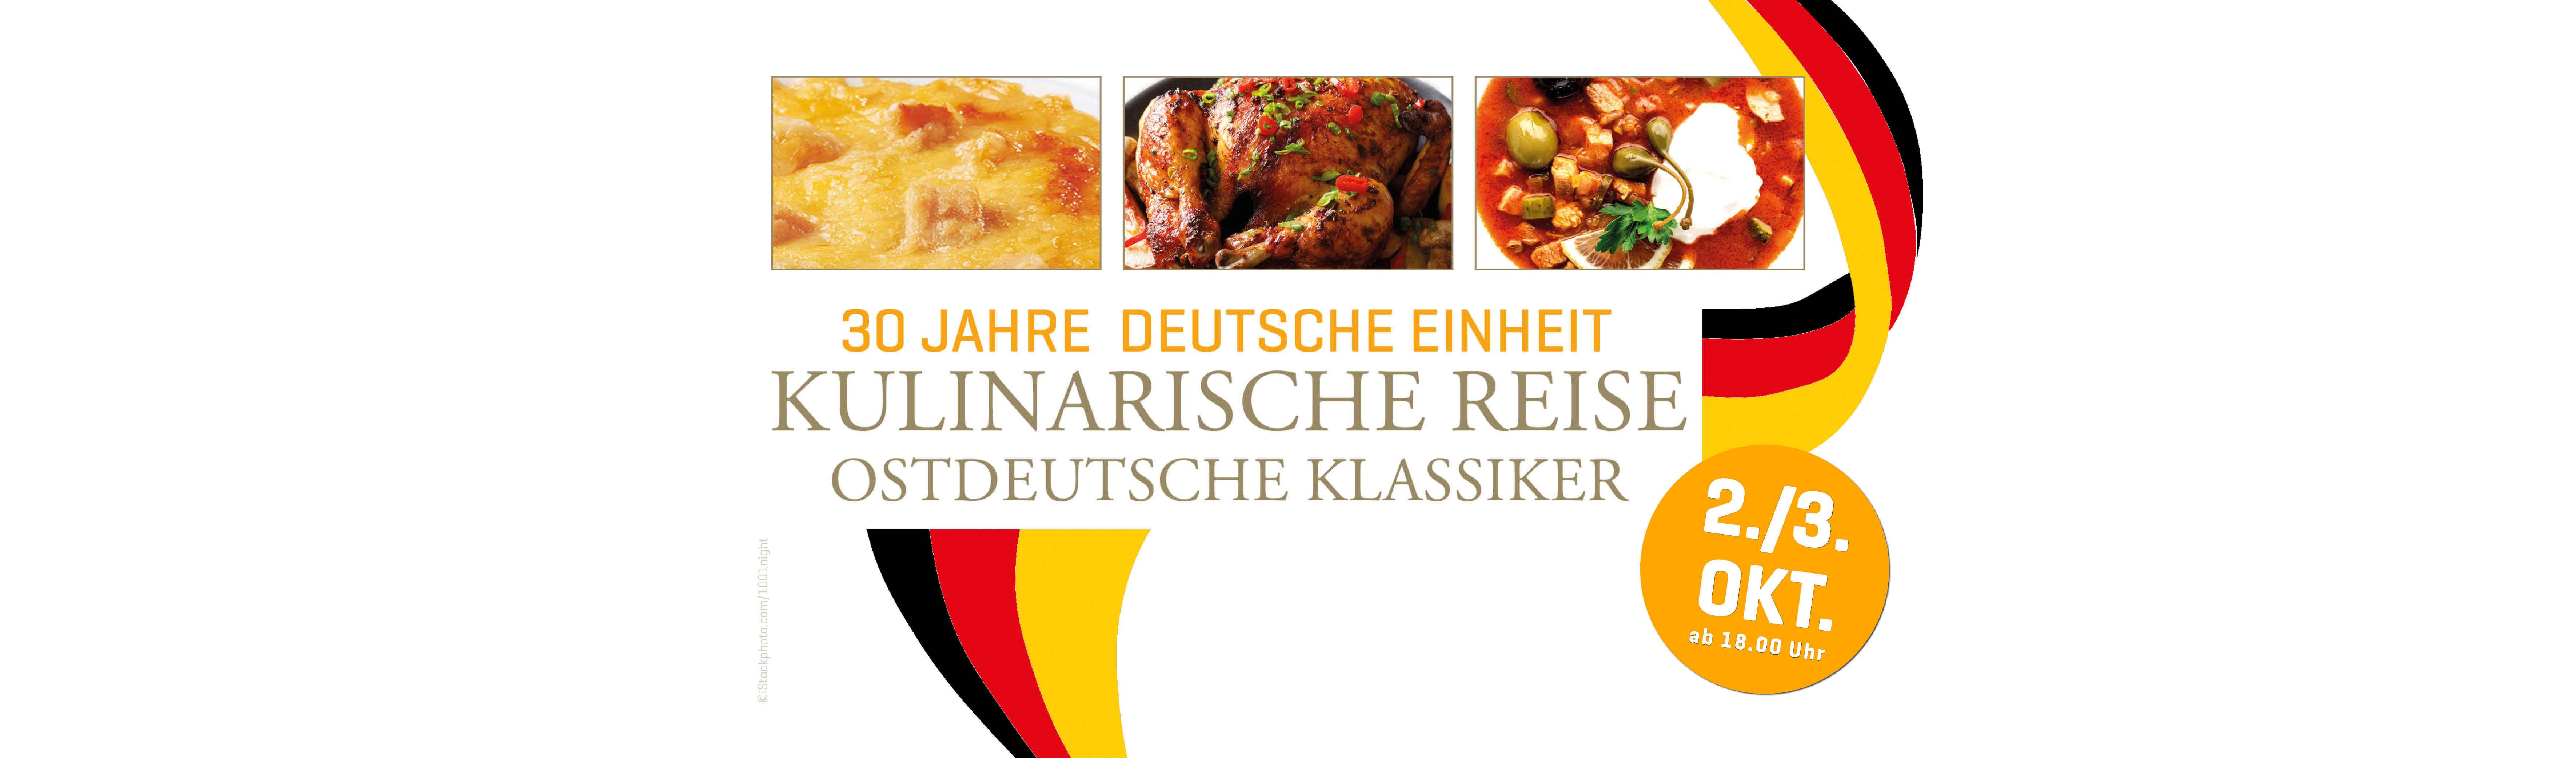 Beitrag-Kulinarische-Reise-Ostdeutsche-Klassiker